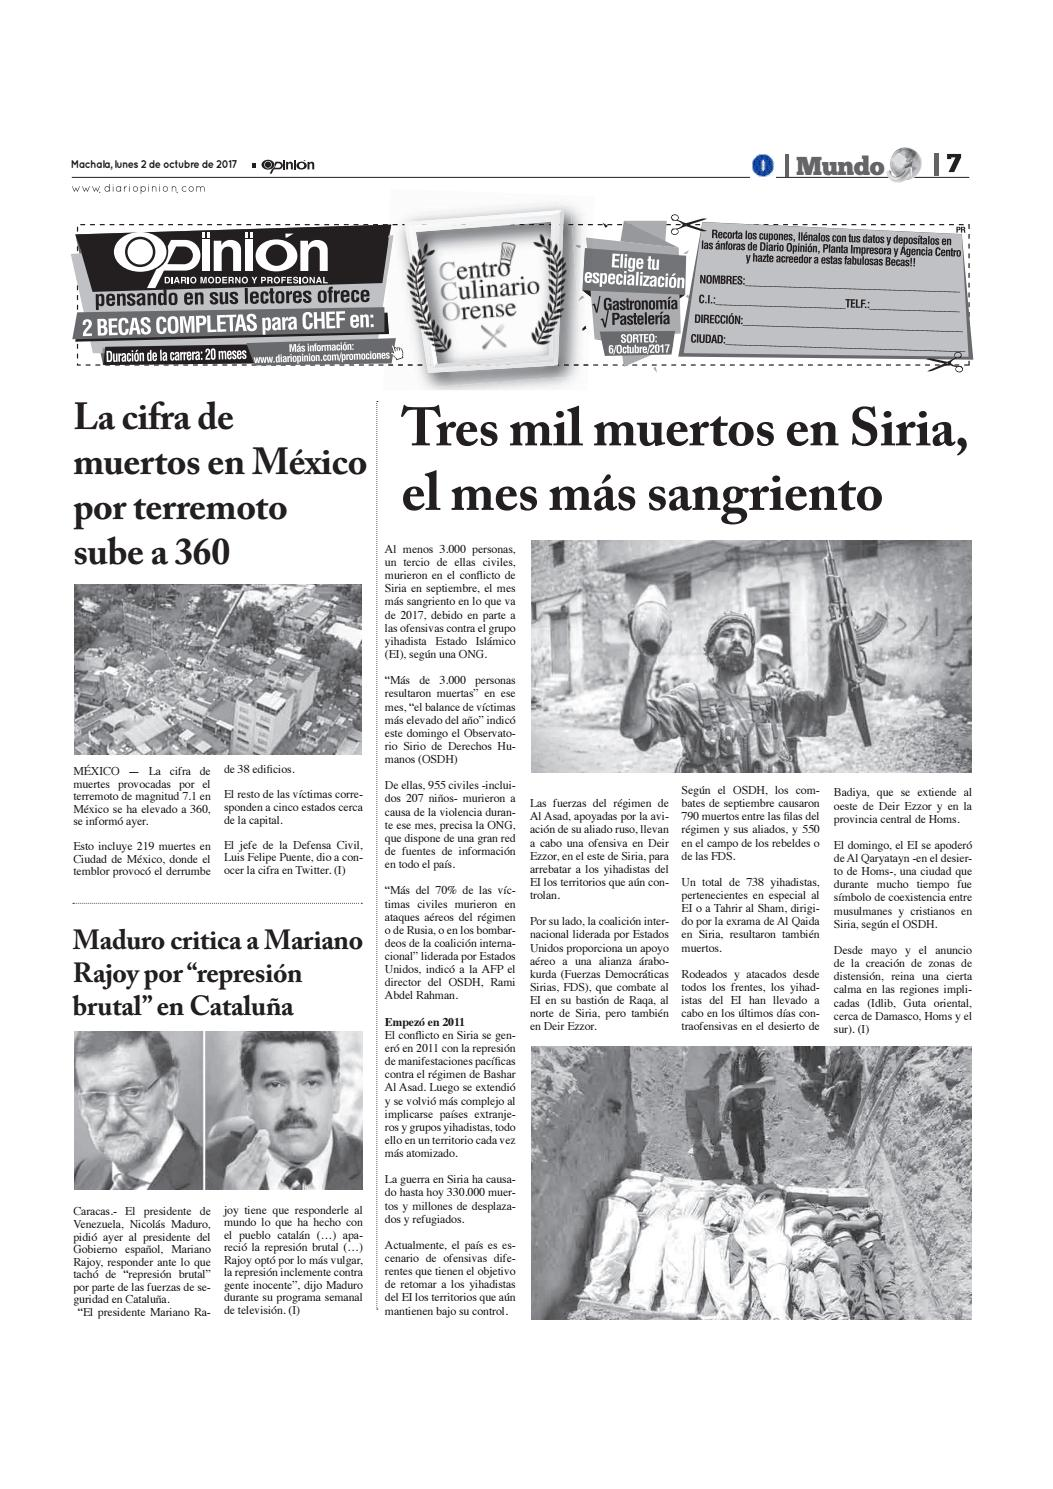 Impreso 02 10 17 by Diario Opinion - issuu